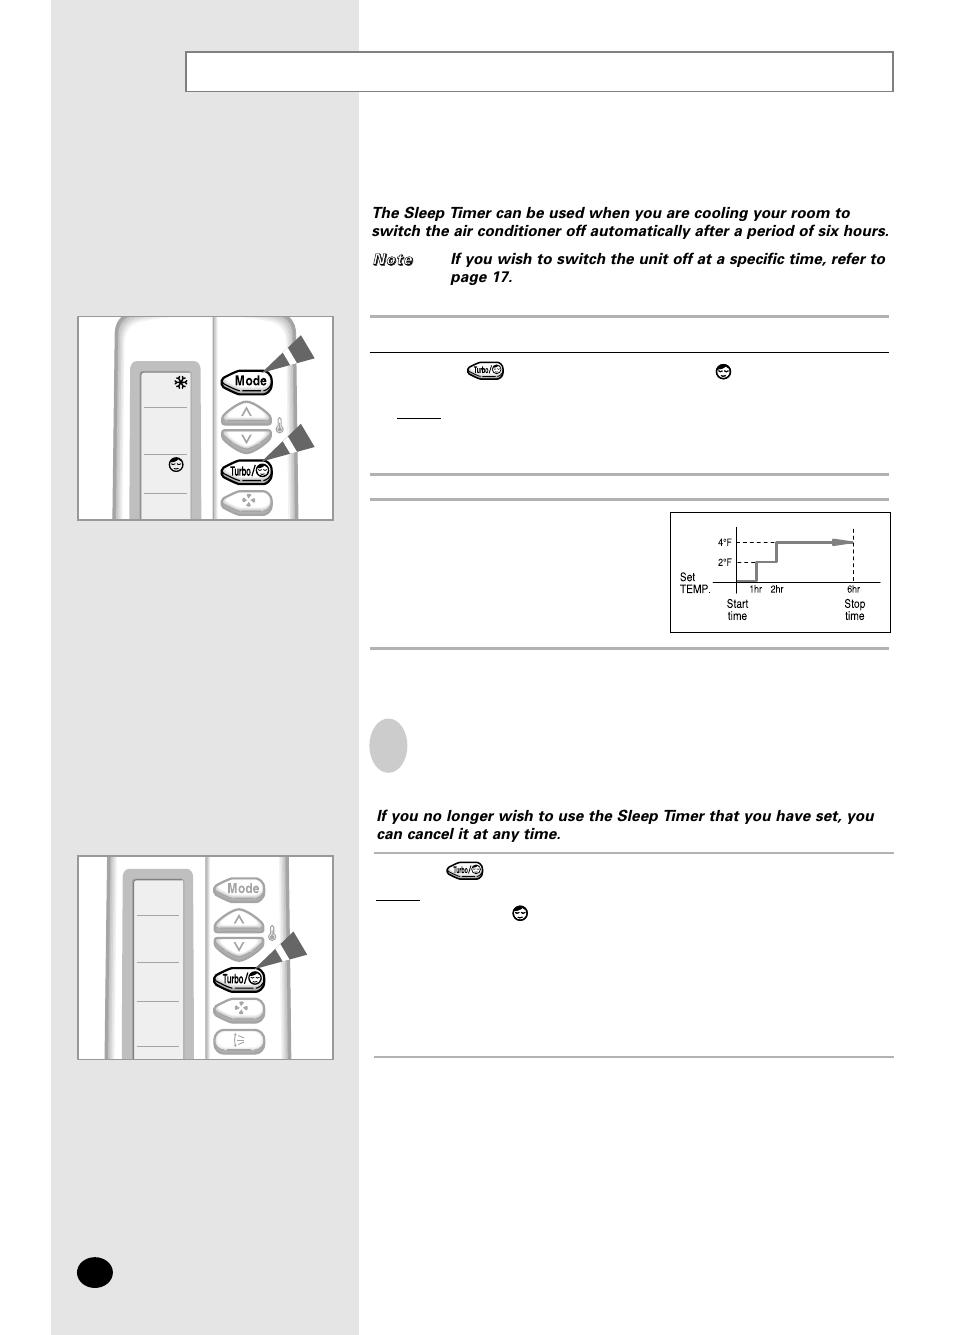 Setting the sleep timer | Samsung AS07A5(6)MA User Manual